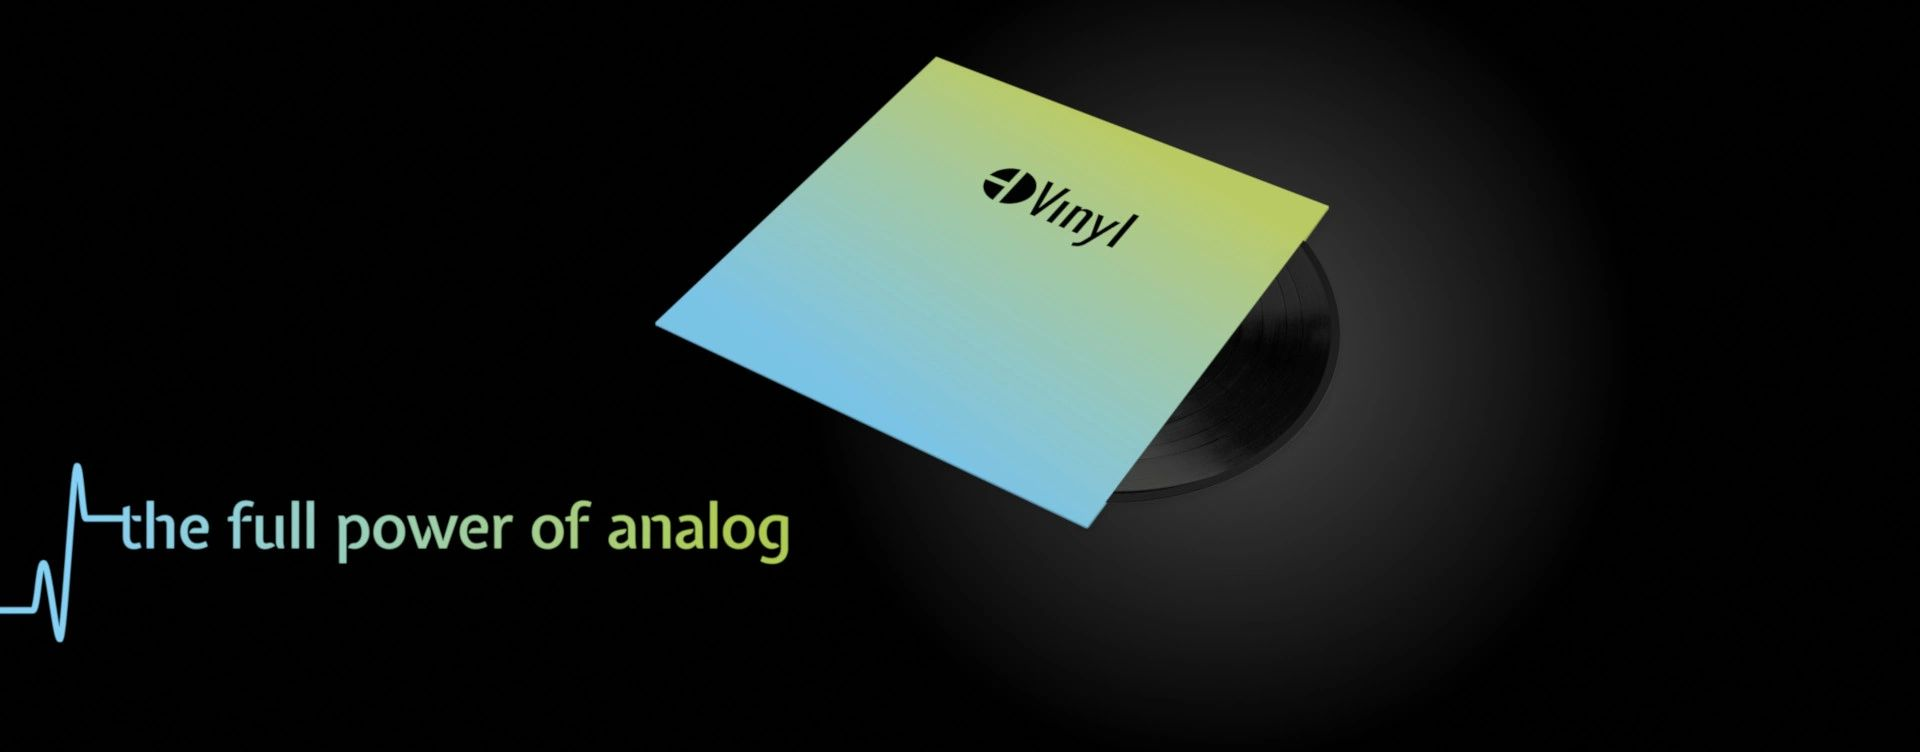 HD Vinyl: The Future of Vinyl Records   HD Vinyl